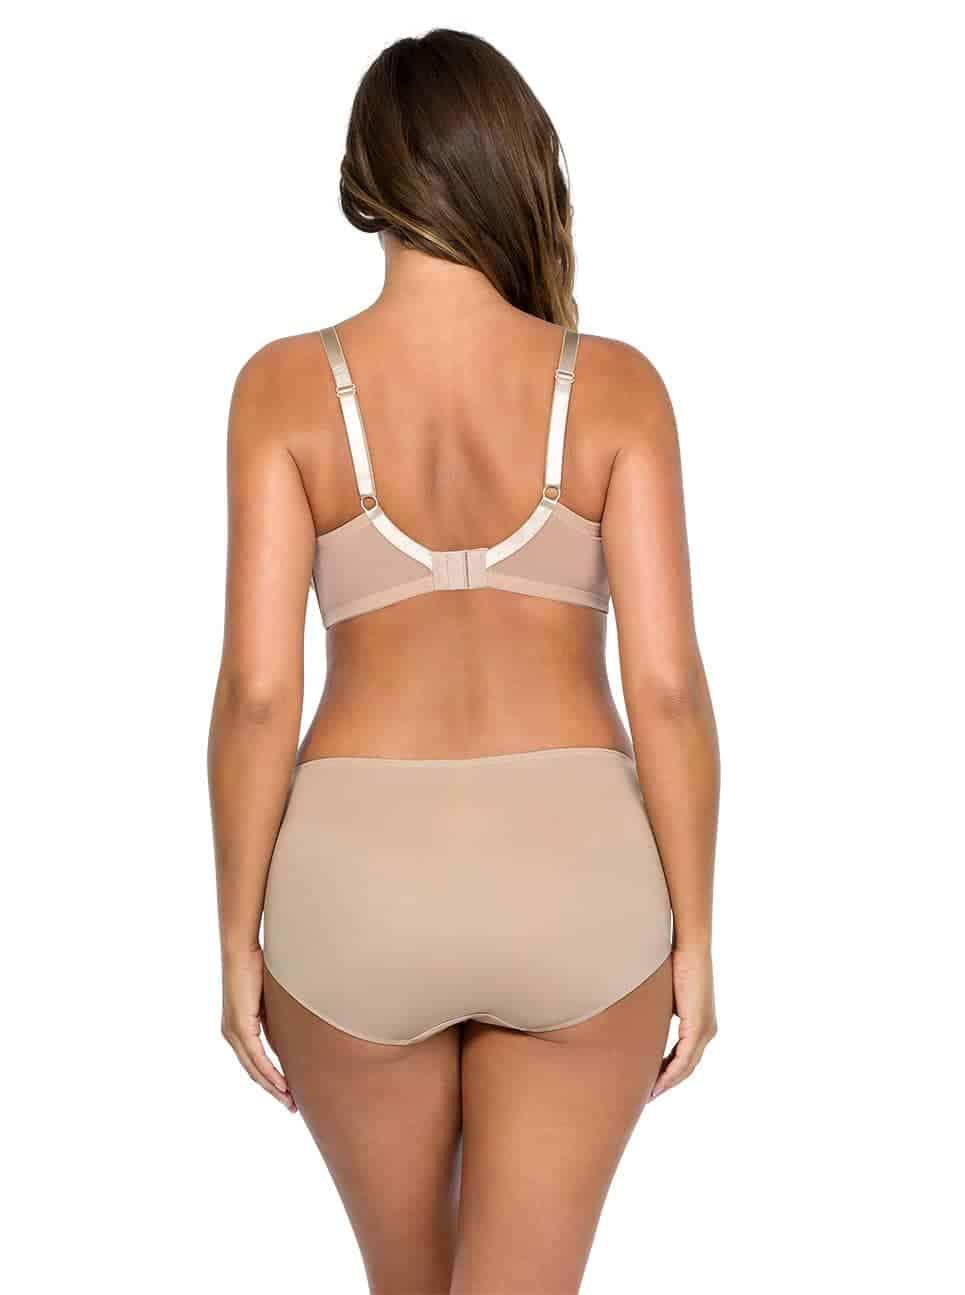 Jeanie StraplessContourBra4815 Hipster4805 ENude Back - Jeanie Hipster - European Nude - 4805